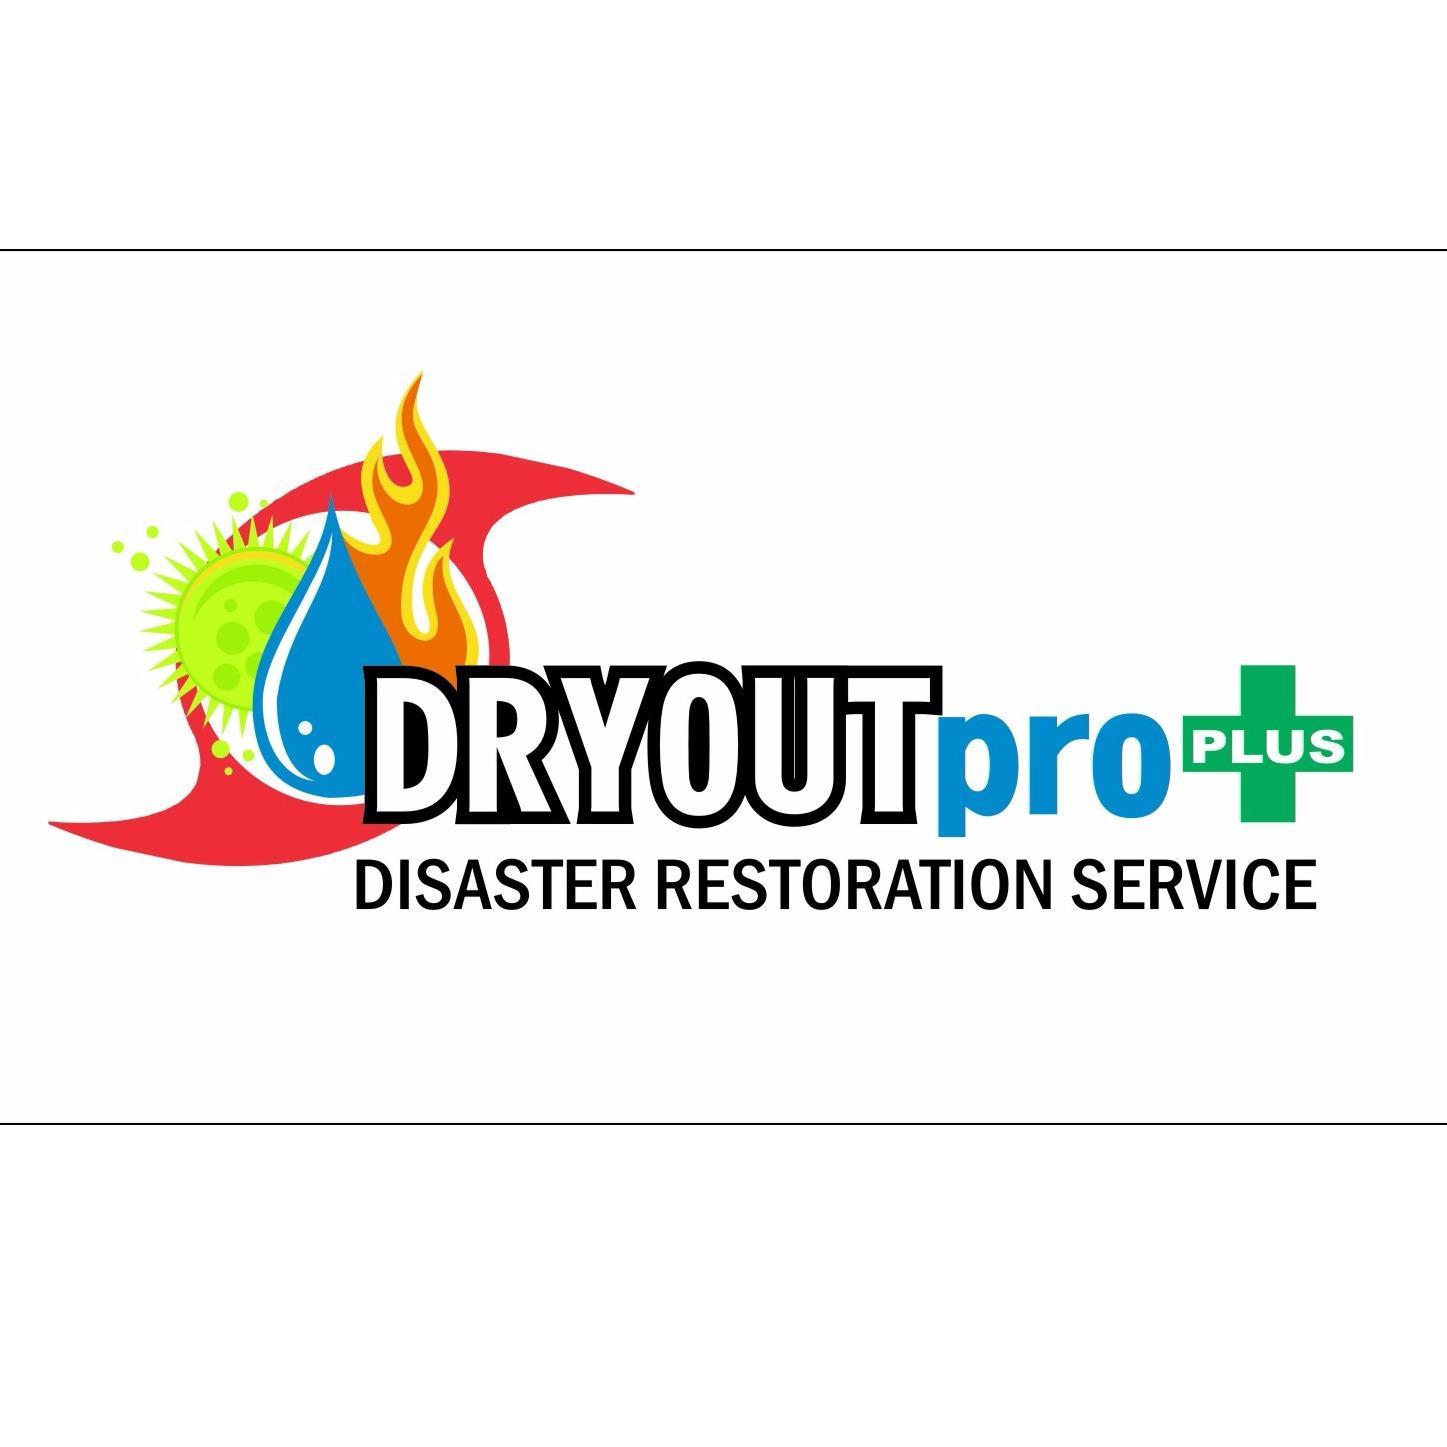 DRYOUTpro PLUS, Inc.